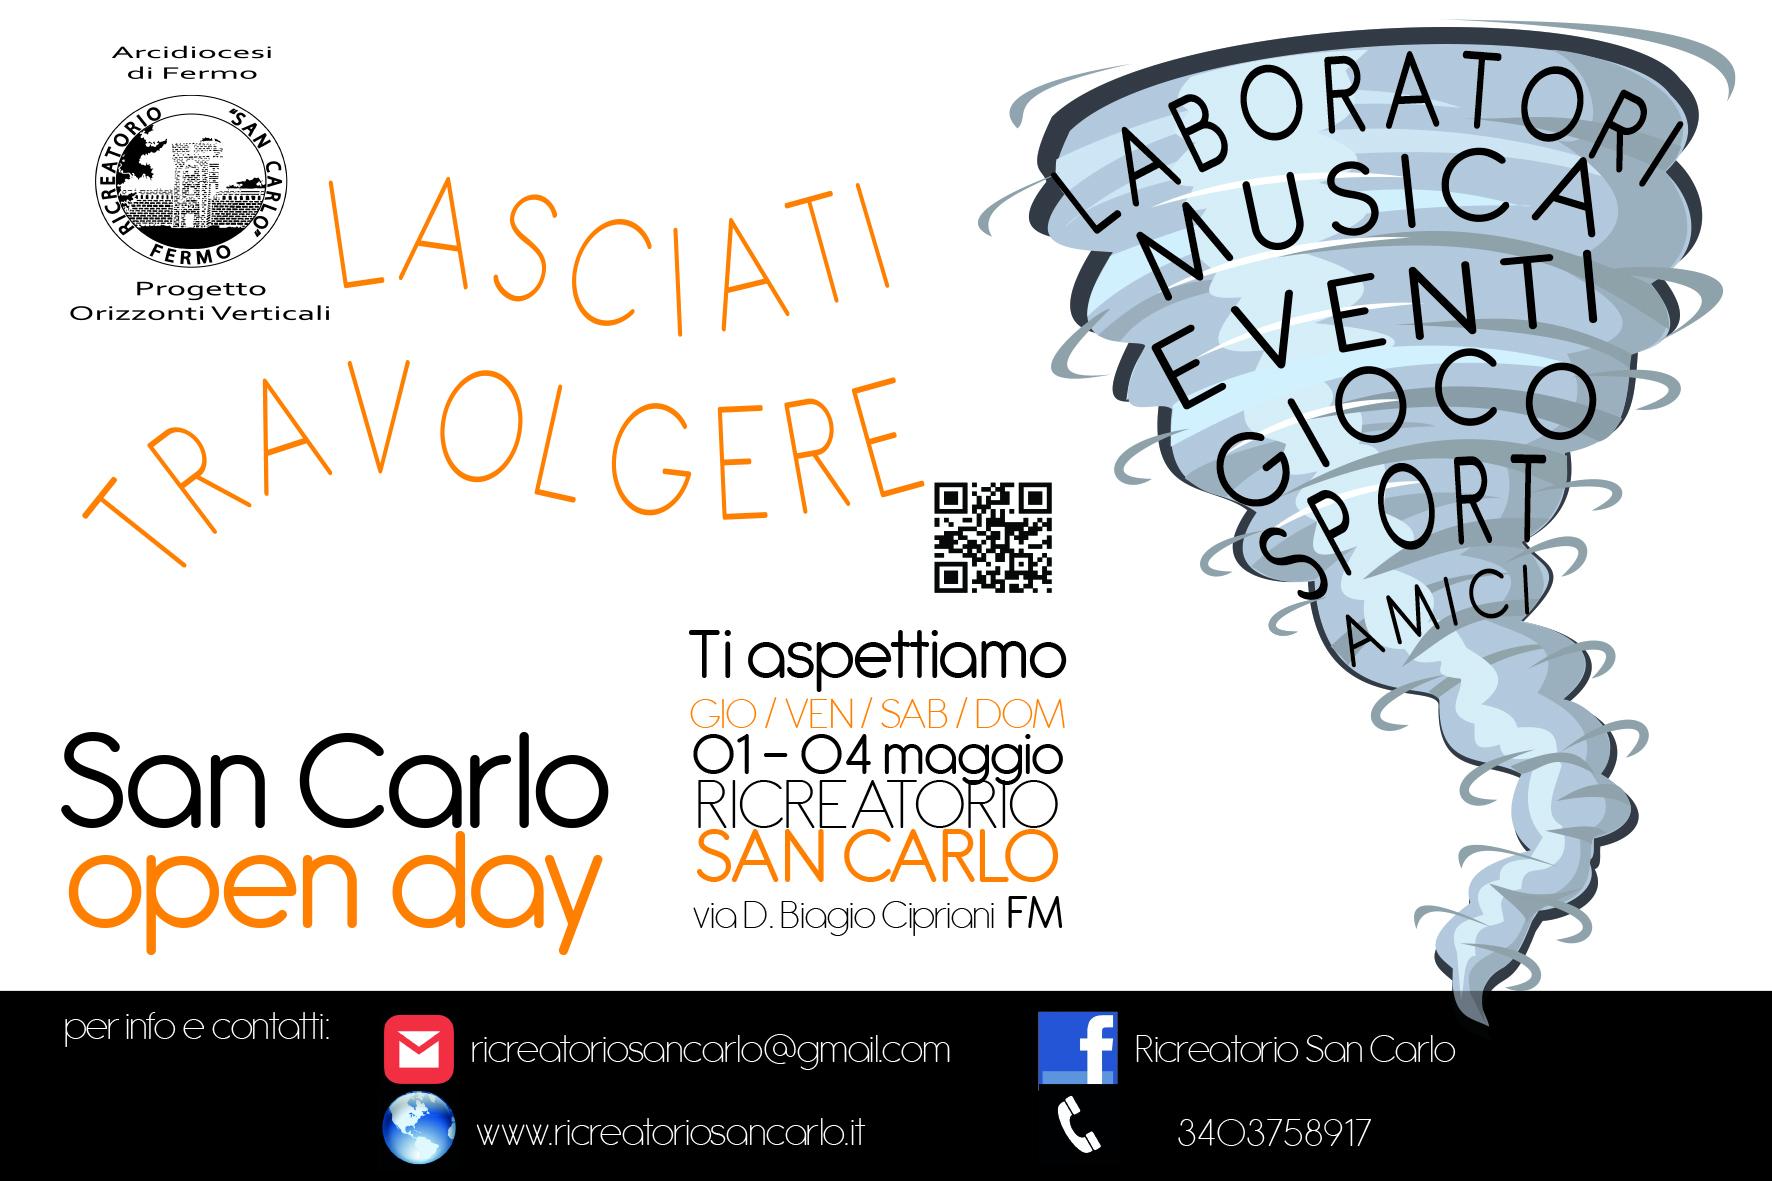 openday San Carlo